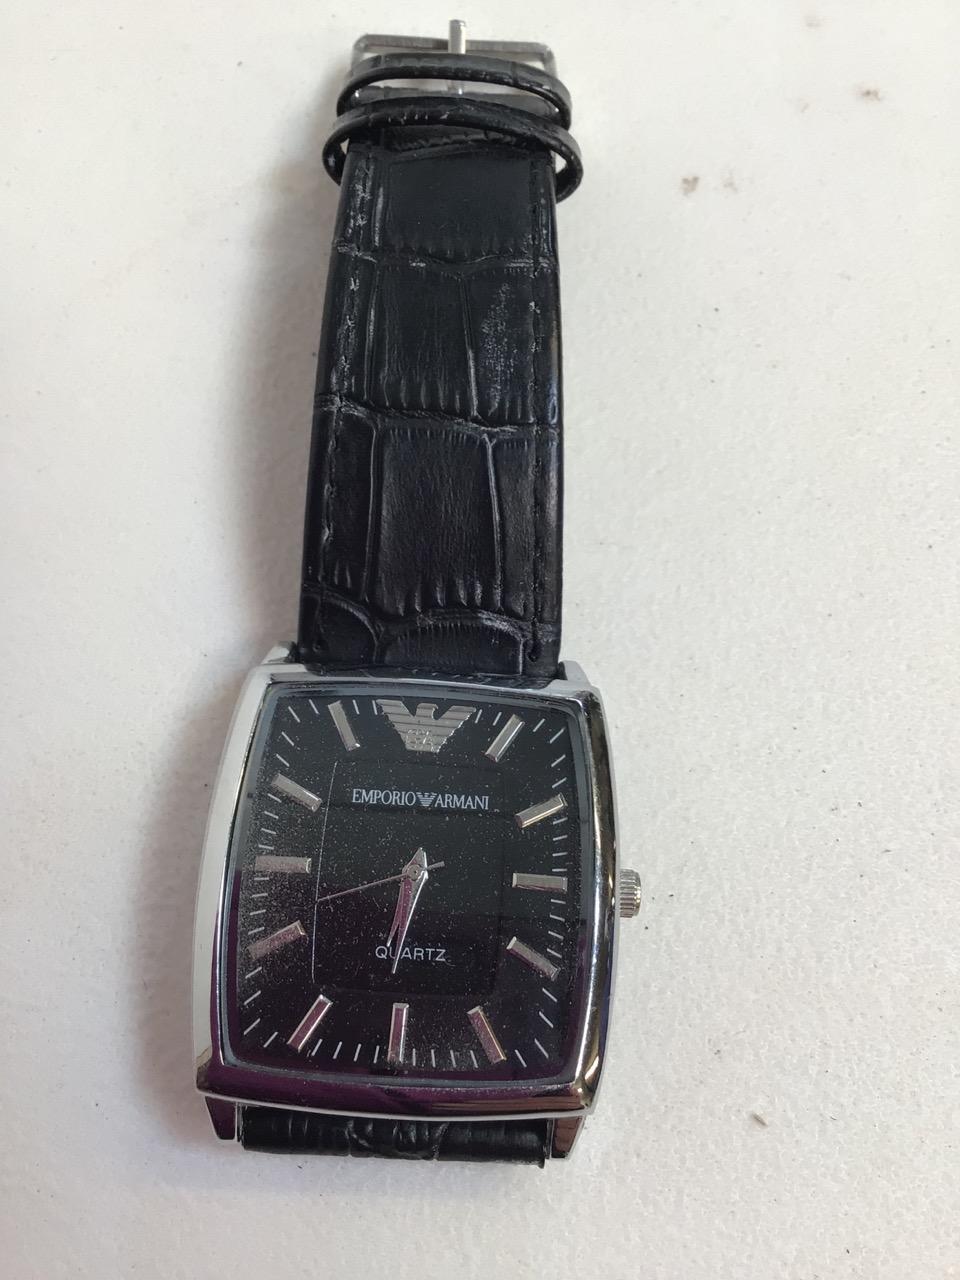 A Emporio Armani Quartz watch. - Image 2 of 3